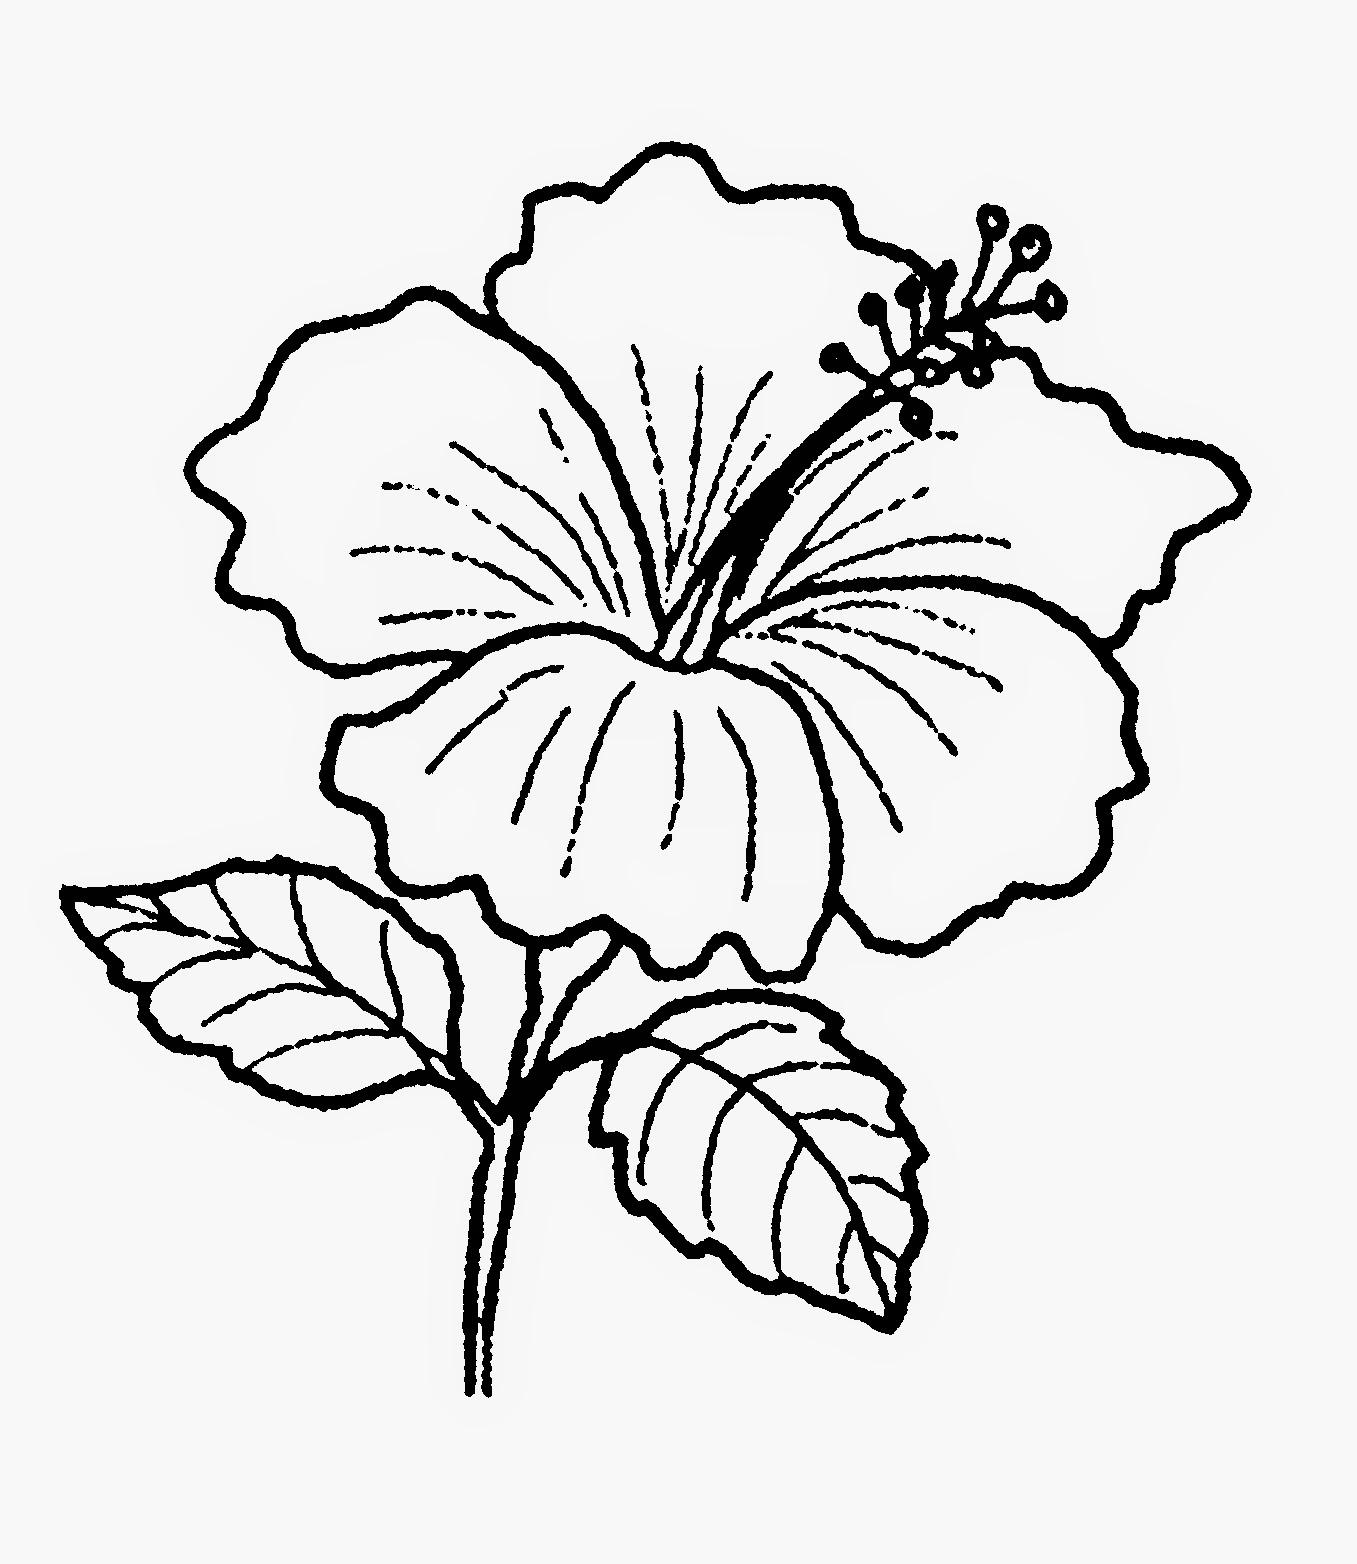 Gambar Bunga Matahari Hitam Putih Iv Kumpulan Gambar Best Trends